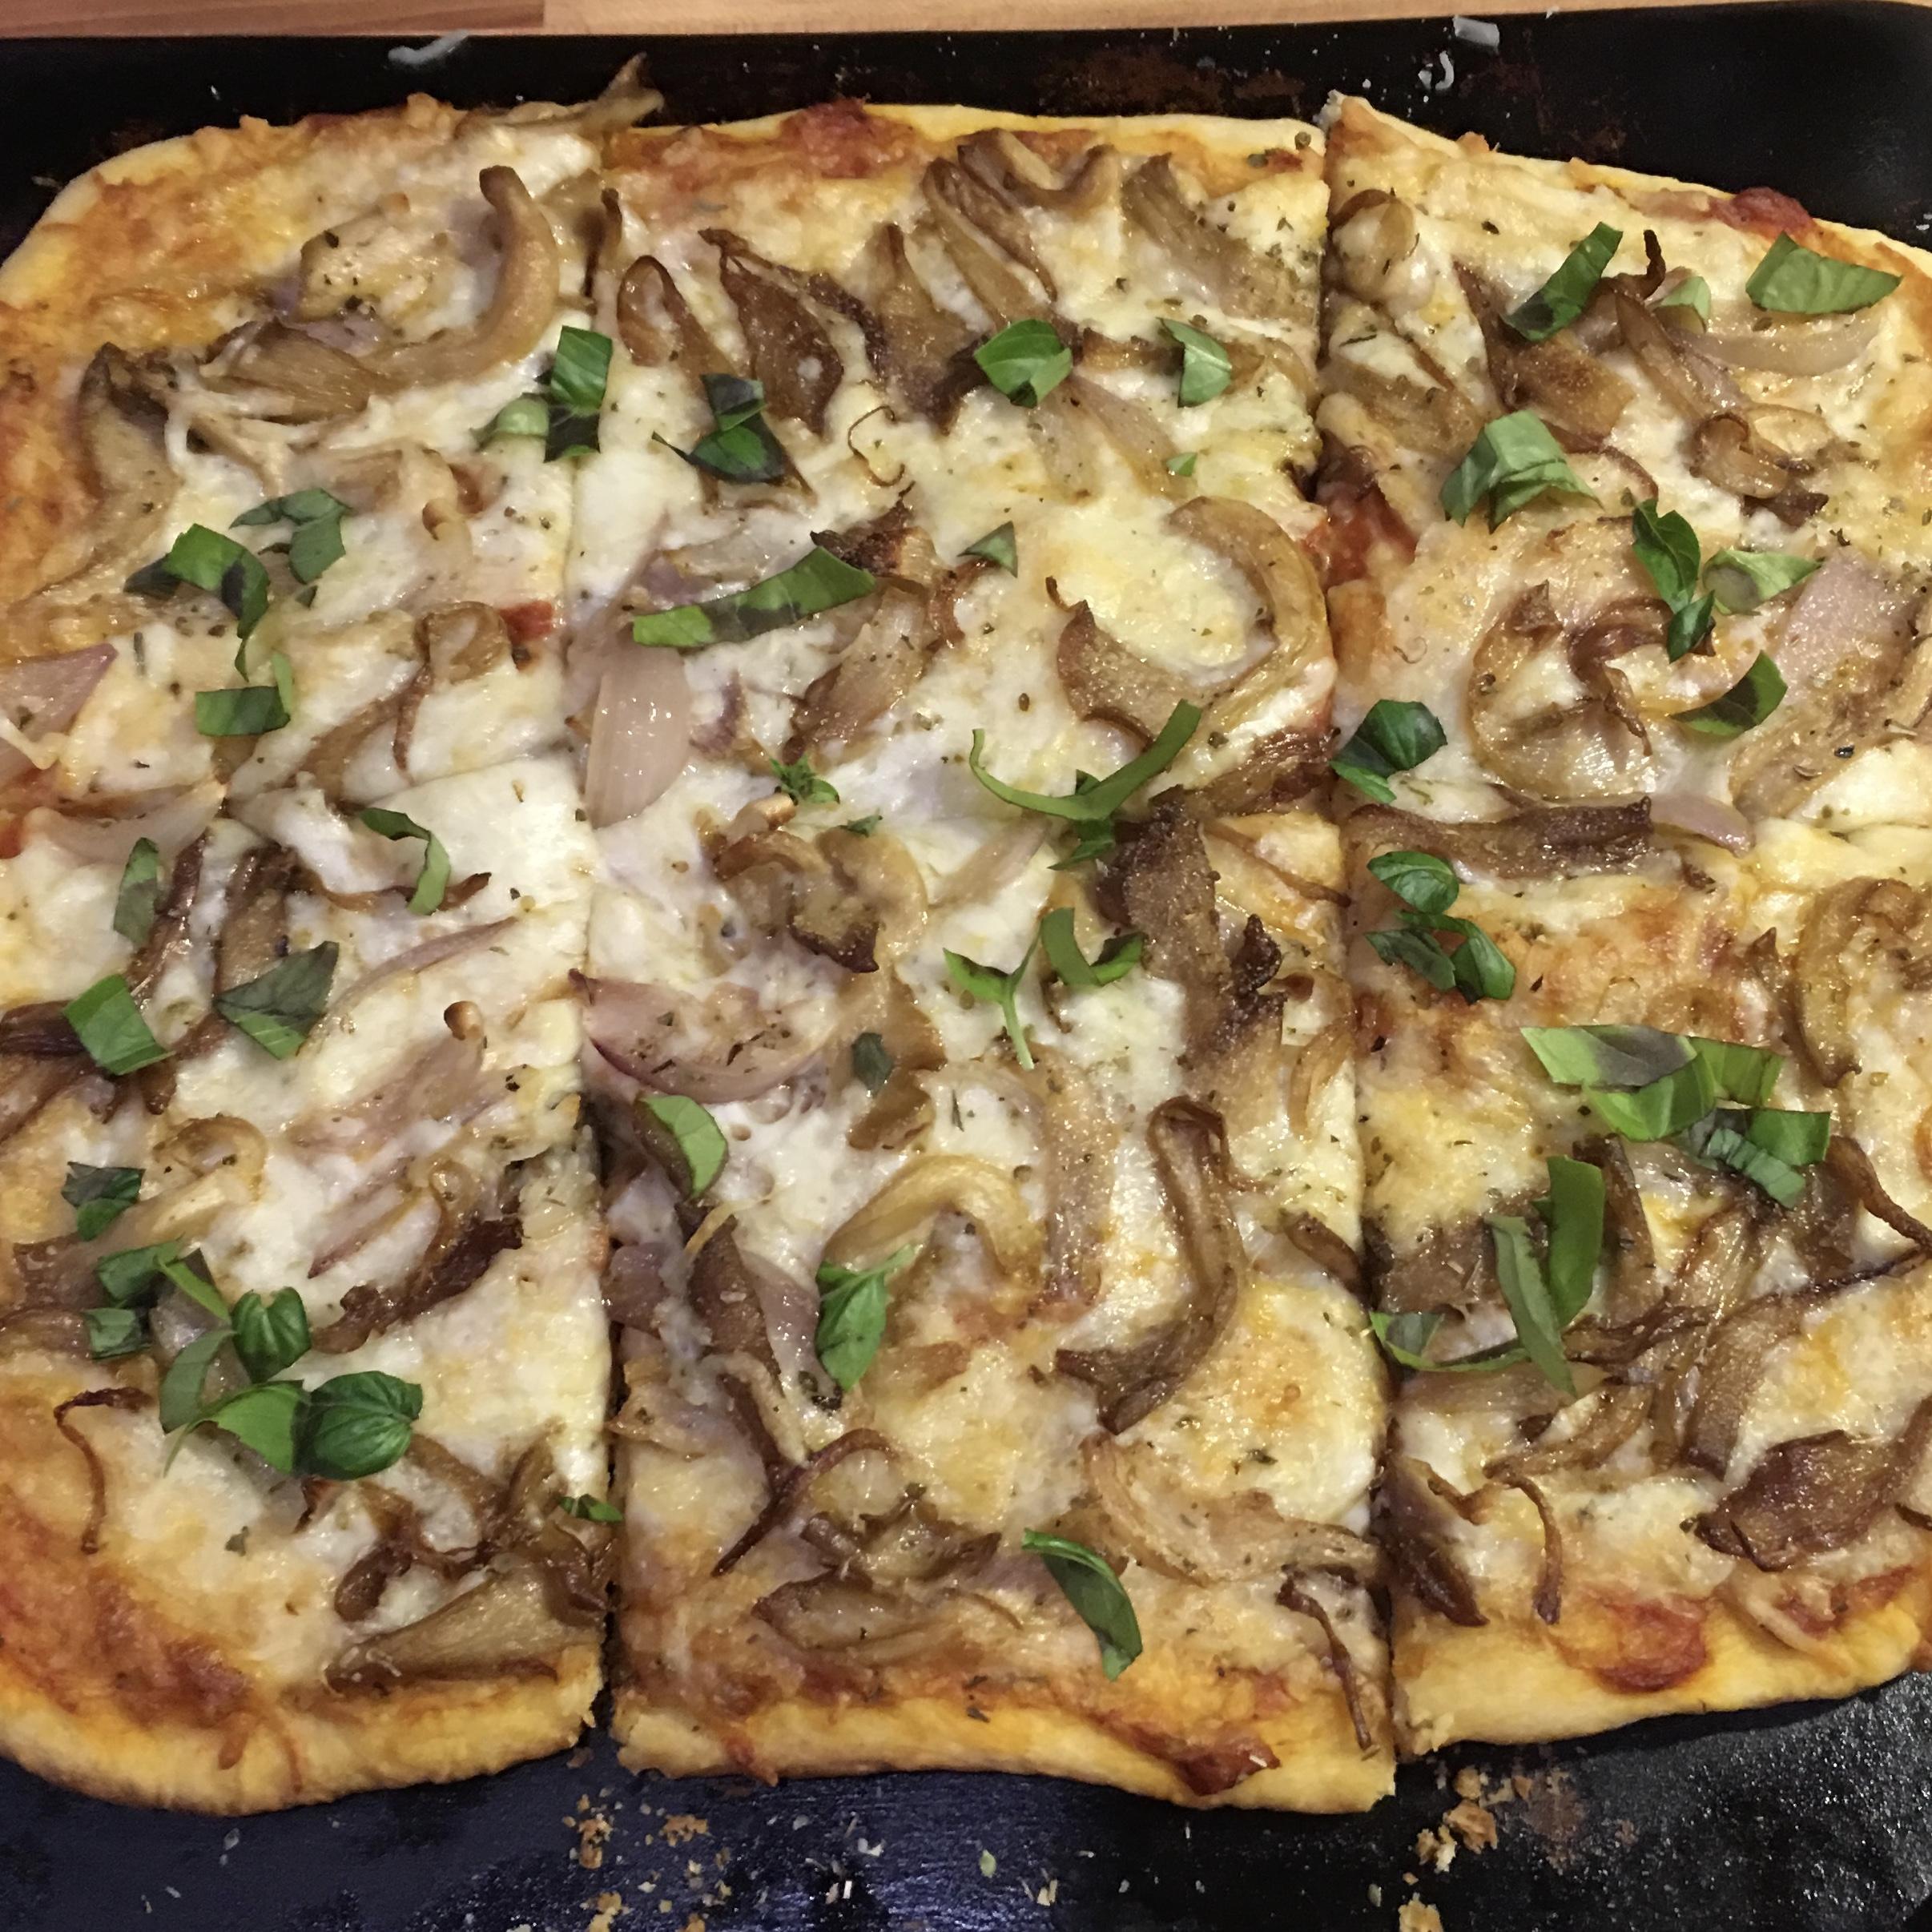 Yummy mushroom pizza